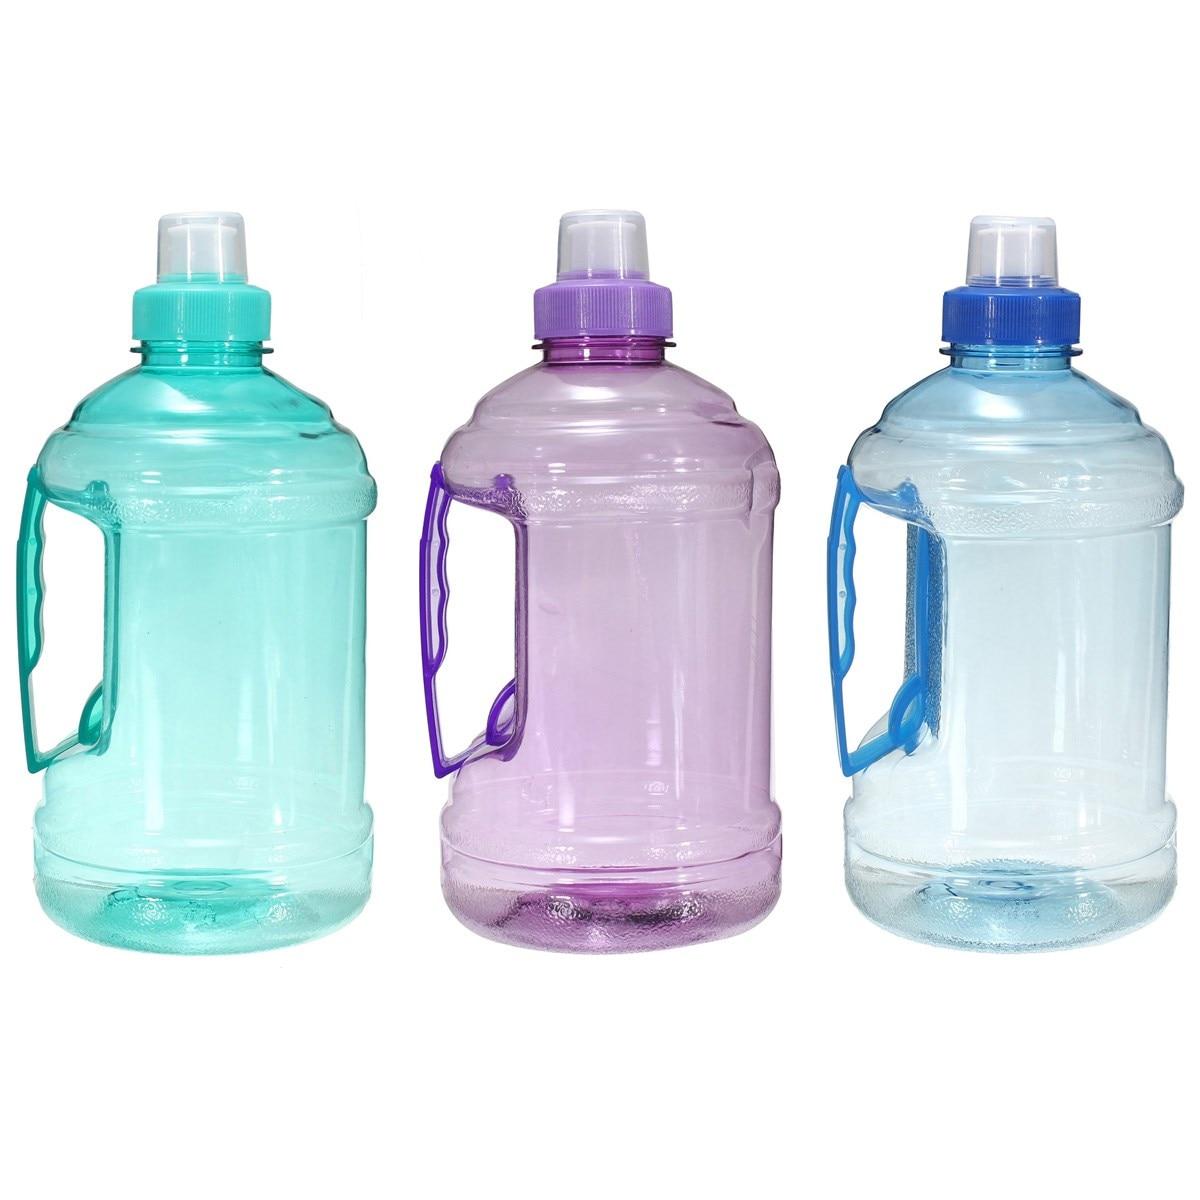 Frasco de bicicleta botella de agua botella bidon bottle bicicleta 500 transparente K